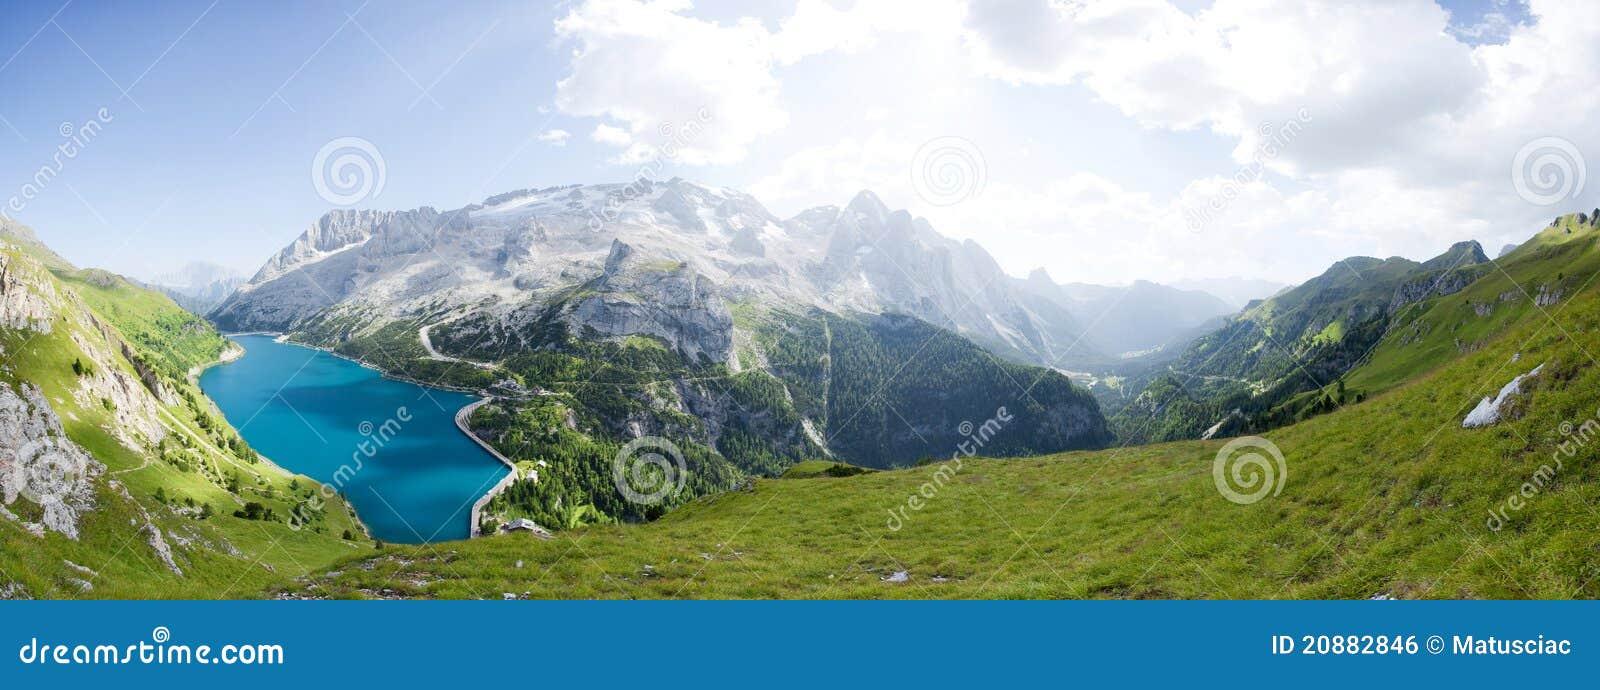 Panorama bonito da montanha - geleira do marmolada